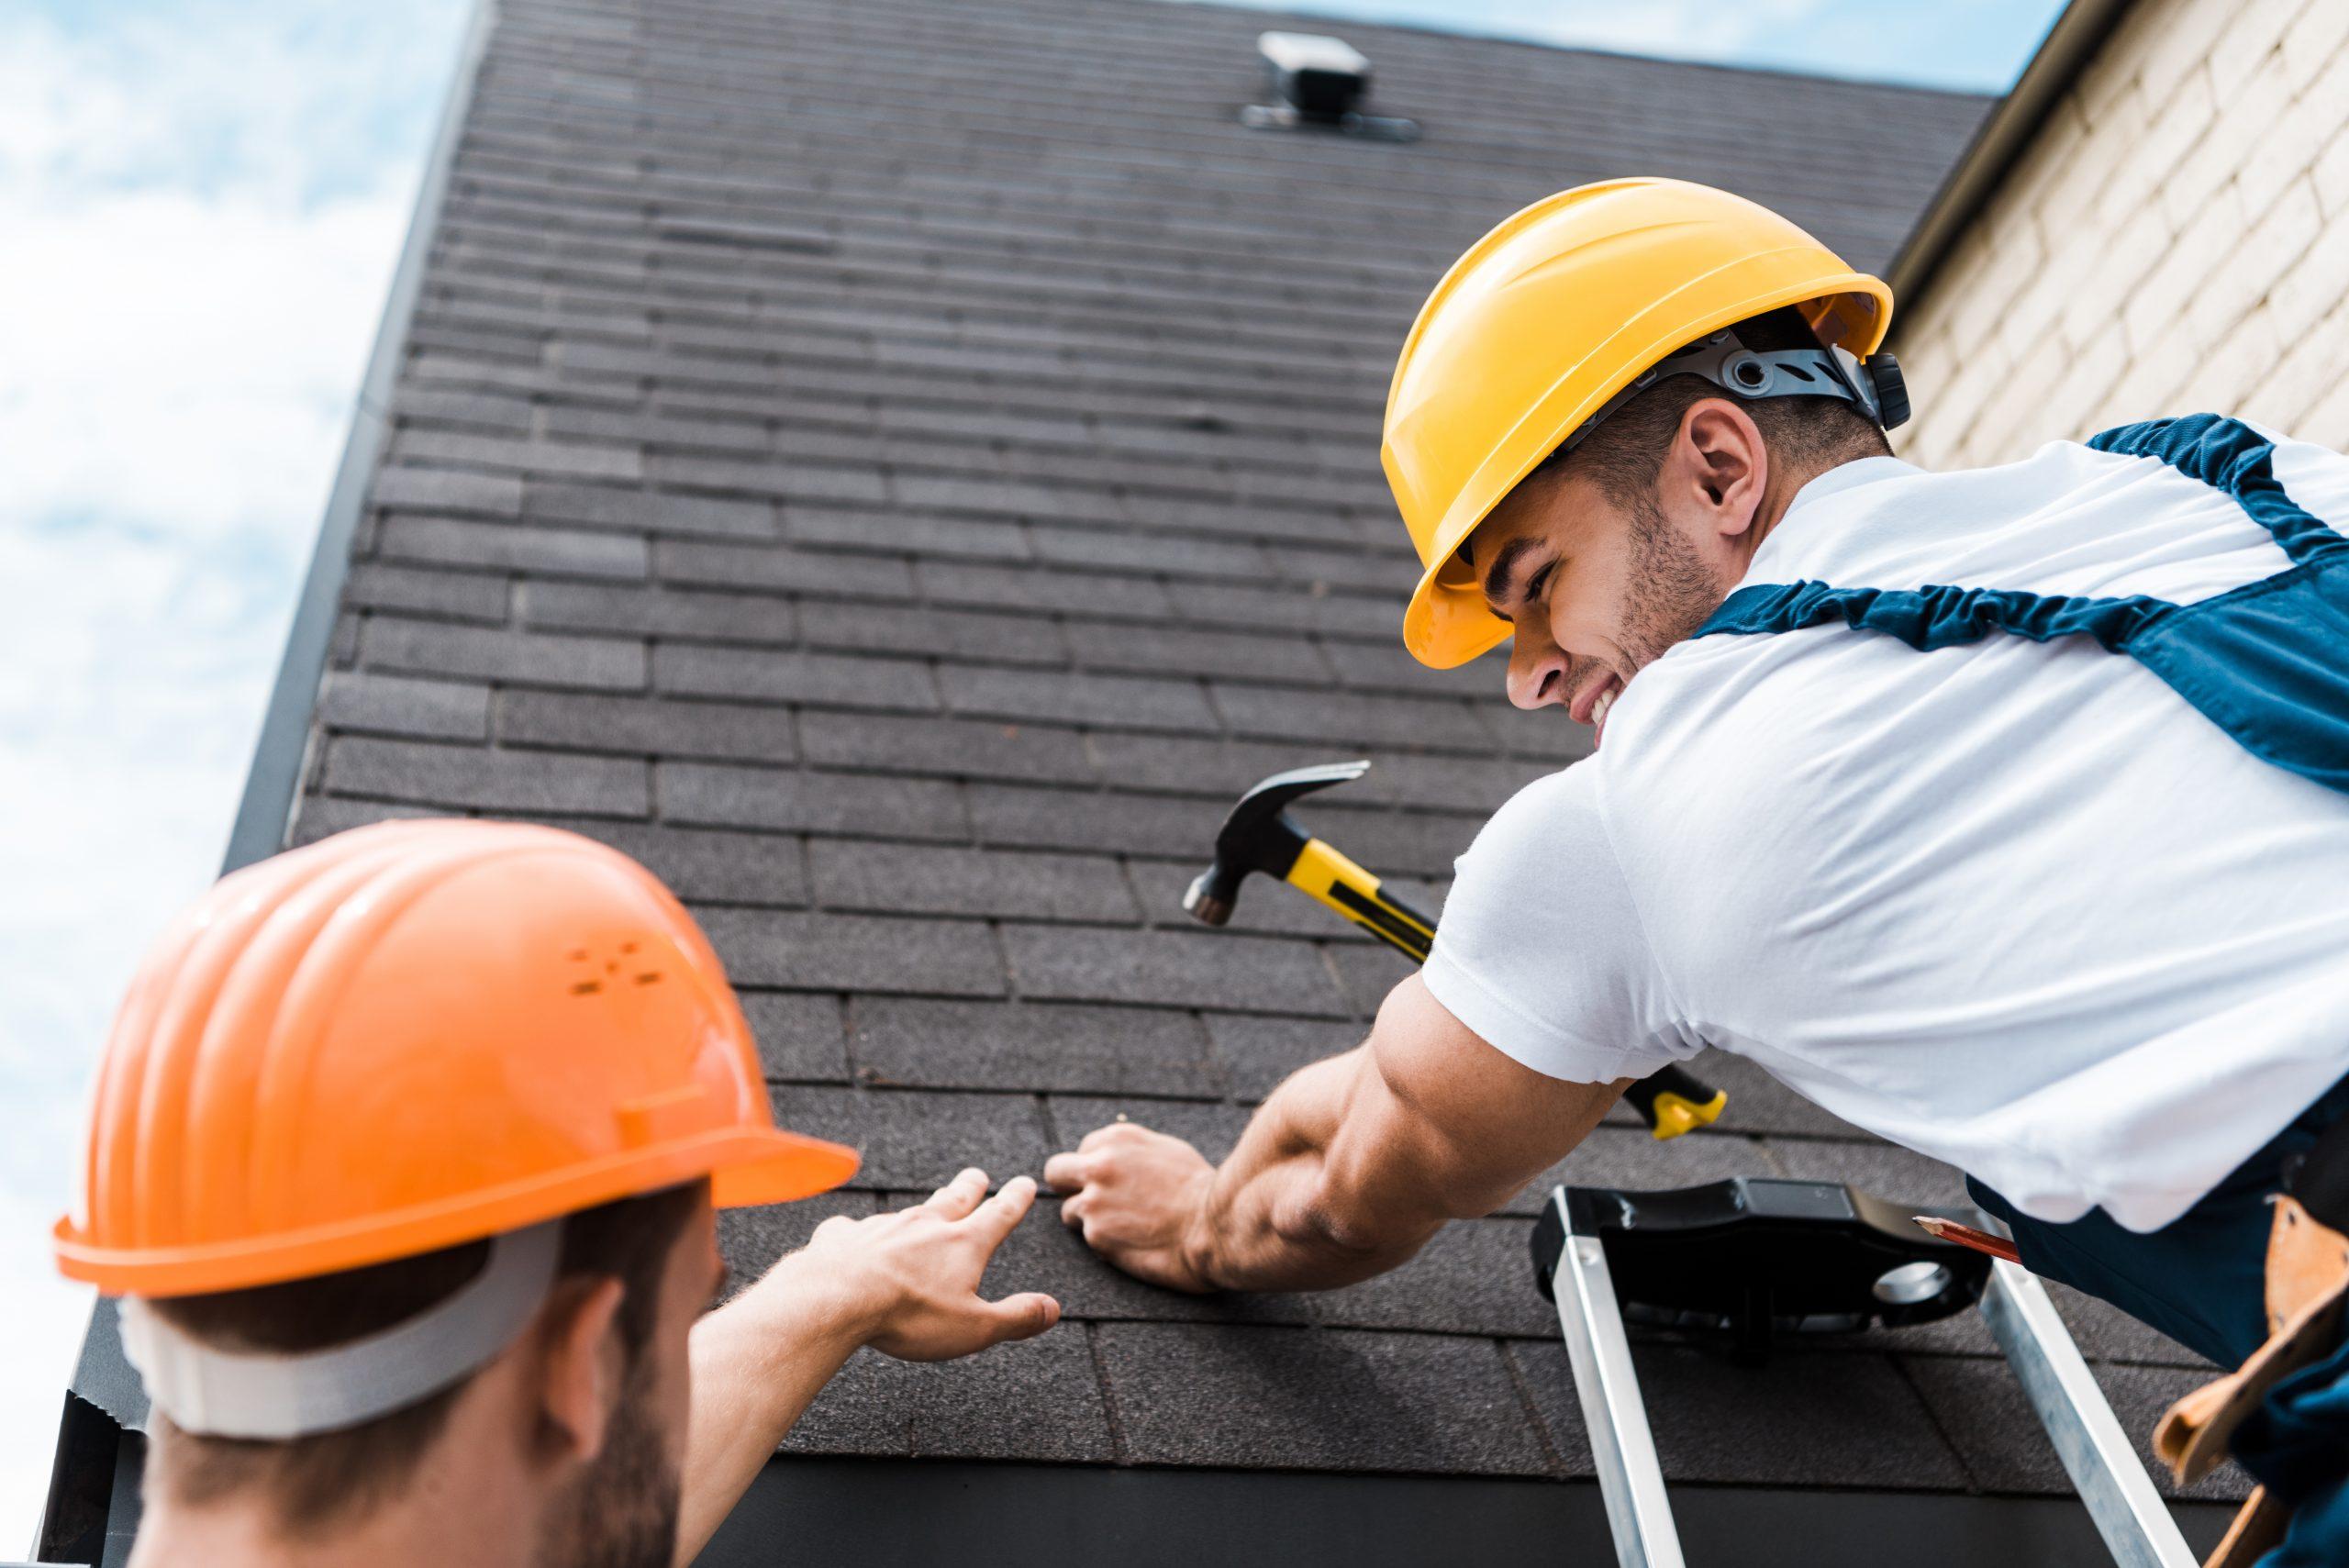 RainTech Roofing - Working on Asphalt Roof